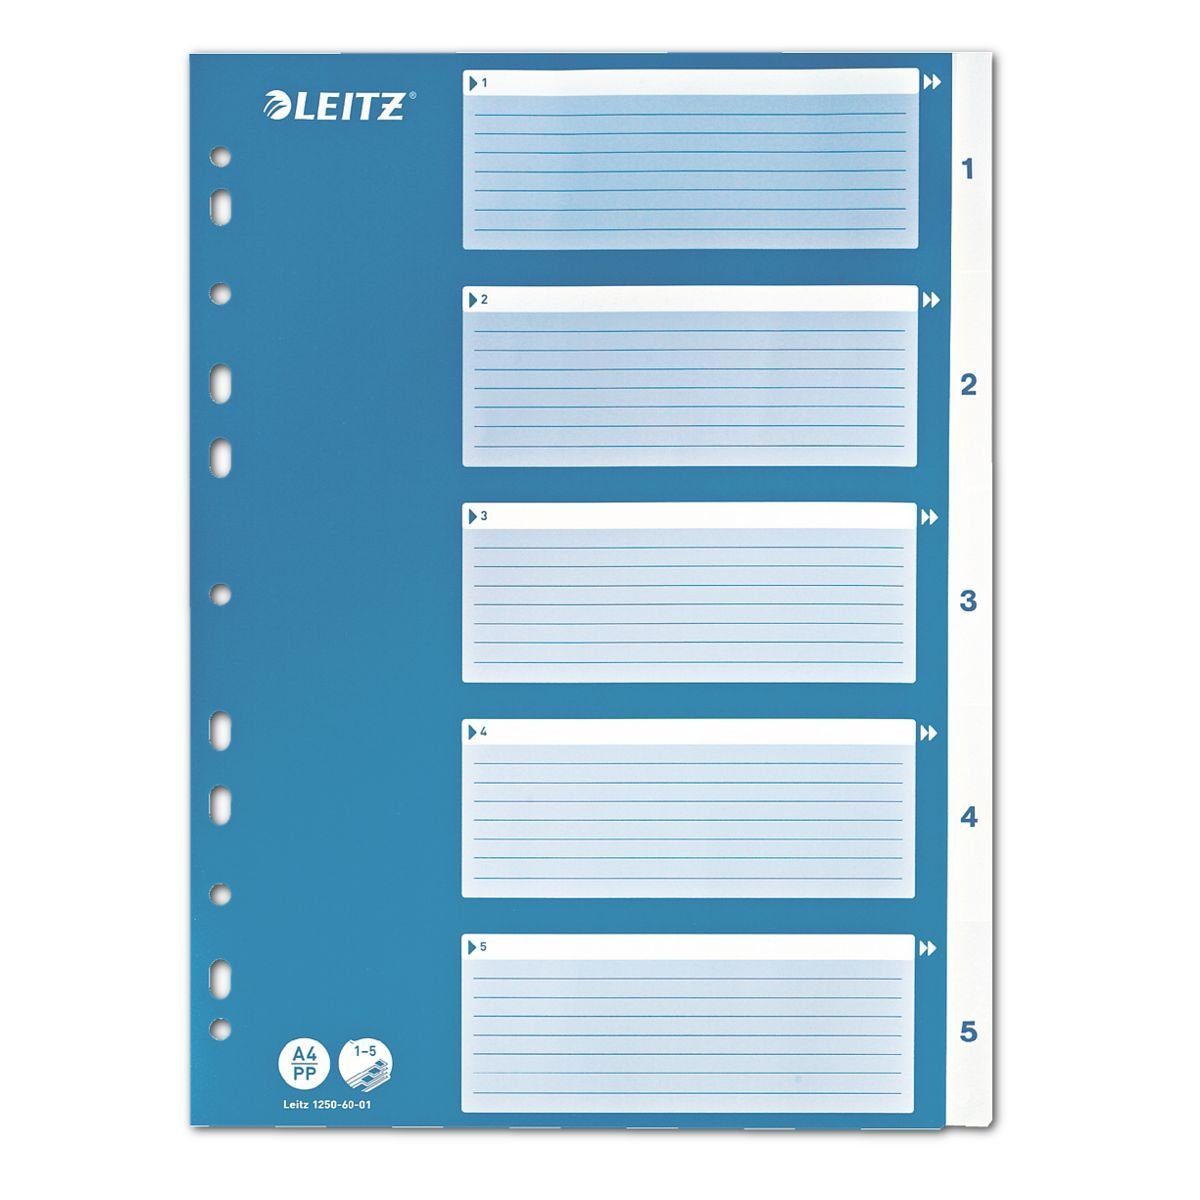 Leitz Kunststoffregister »1250«